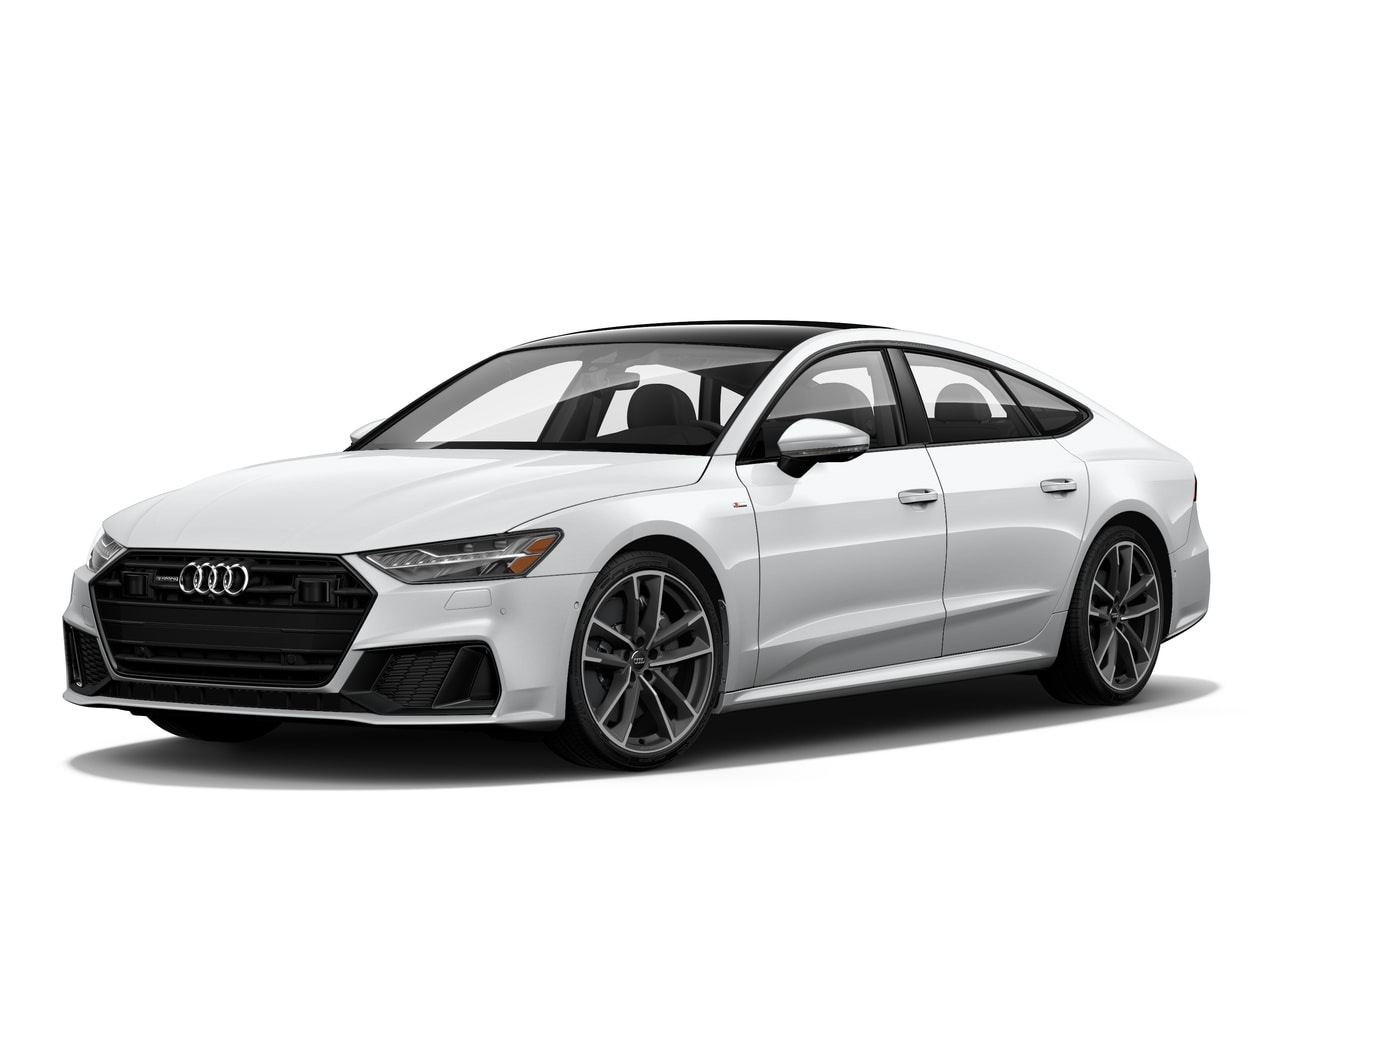 2020 Audi A7 Hatchback